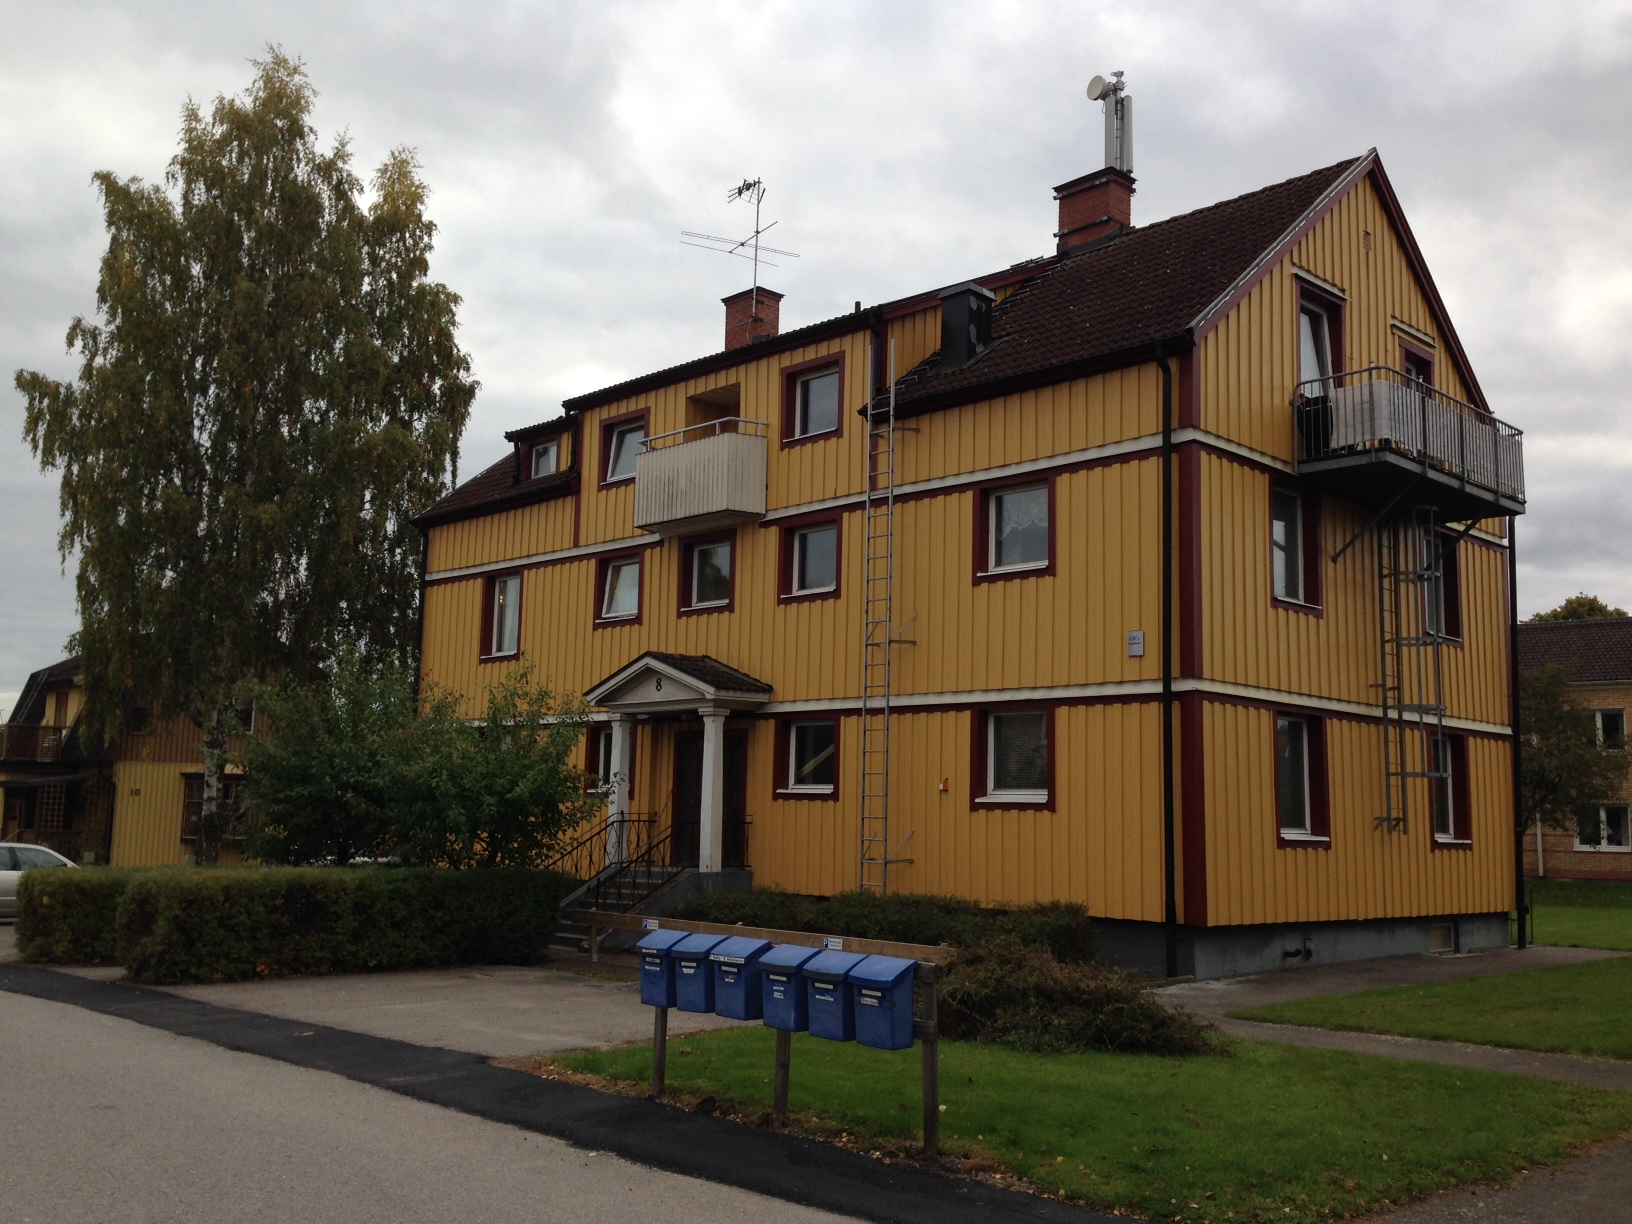 Dalhemsvägen, Karlskoga